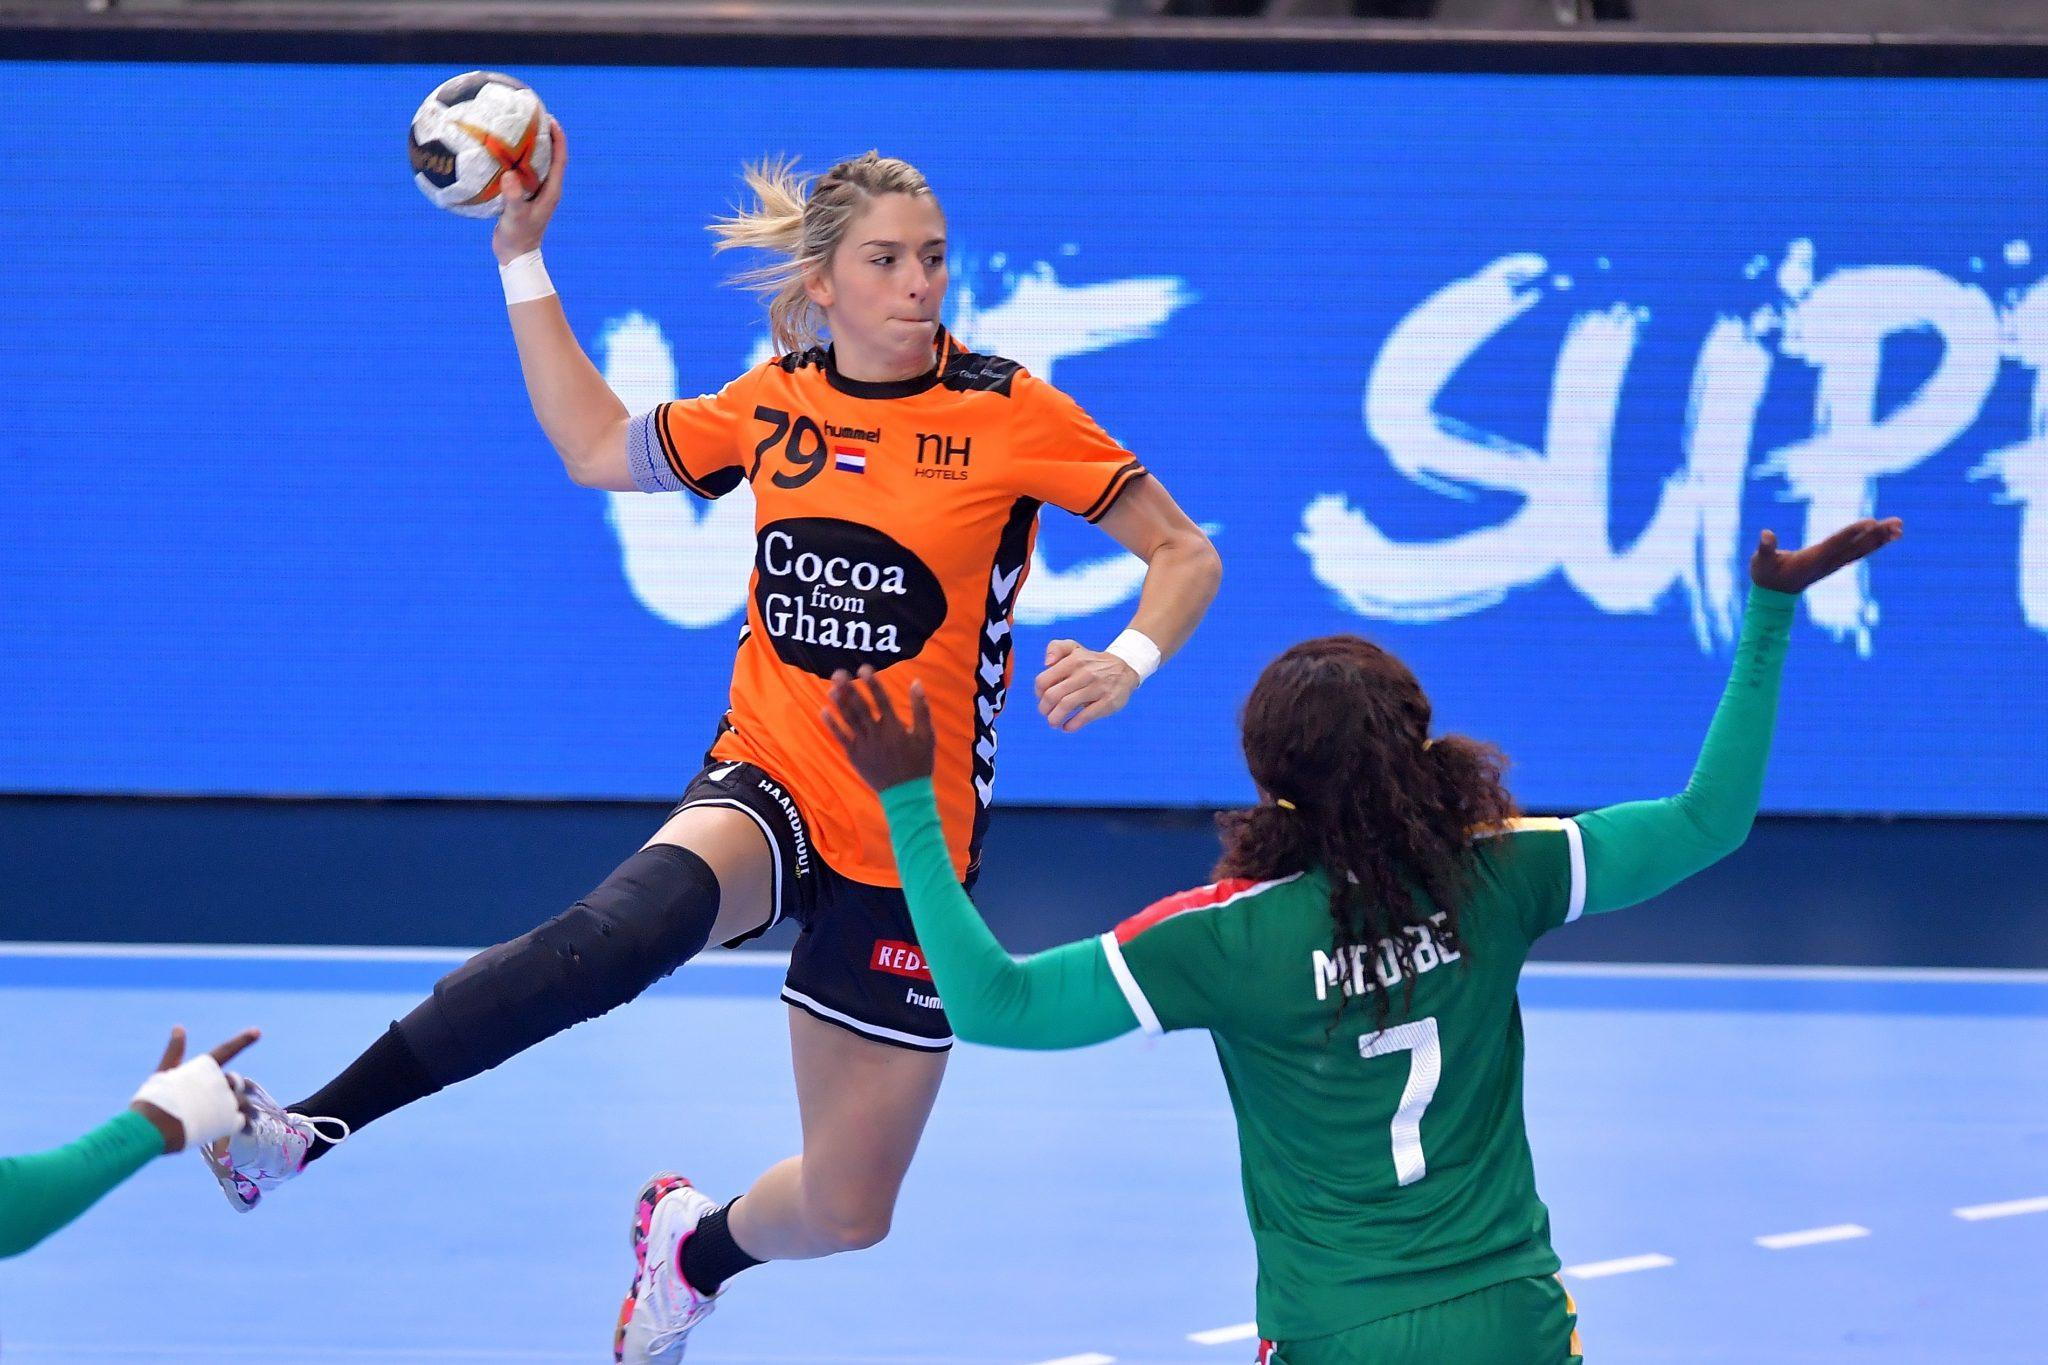 5-12-2017 HANDBAL:NEDERLAND-KAMEROEN:LEIPZIG WK Handbal Dames 2017 Nederland - Kameroen Estavana Polman #79 NED  Foto: Henk Seppen